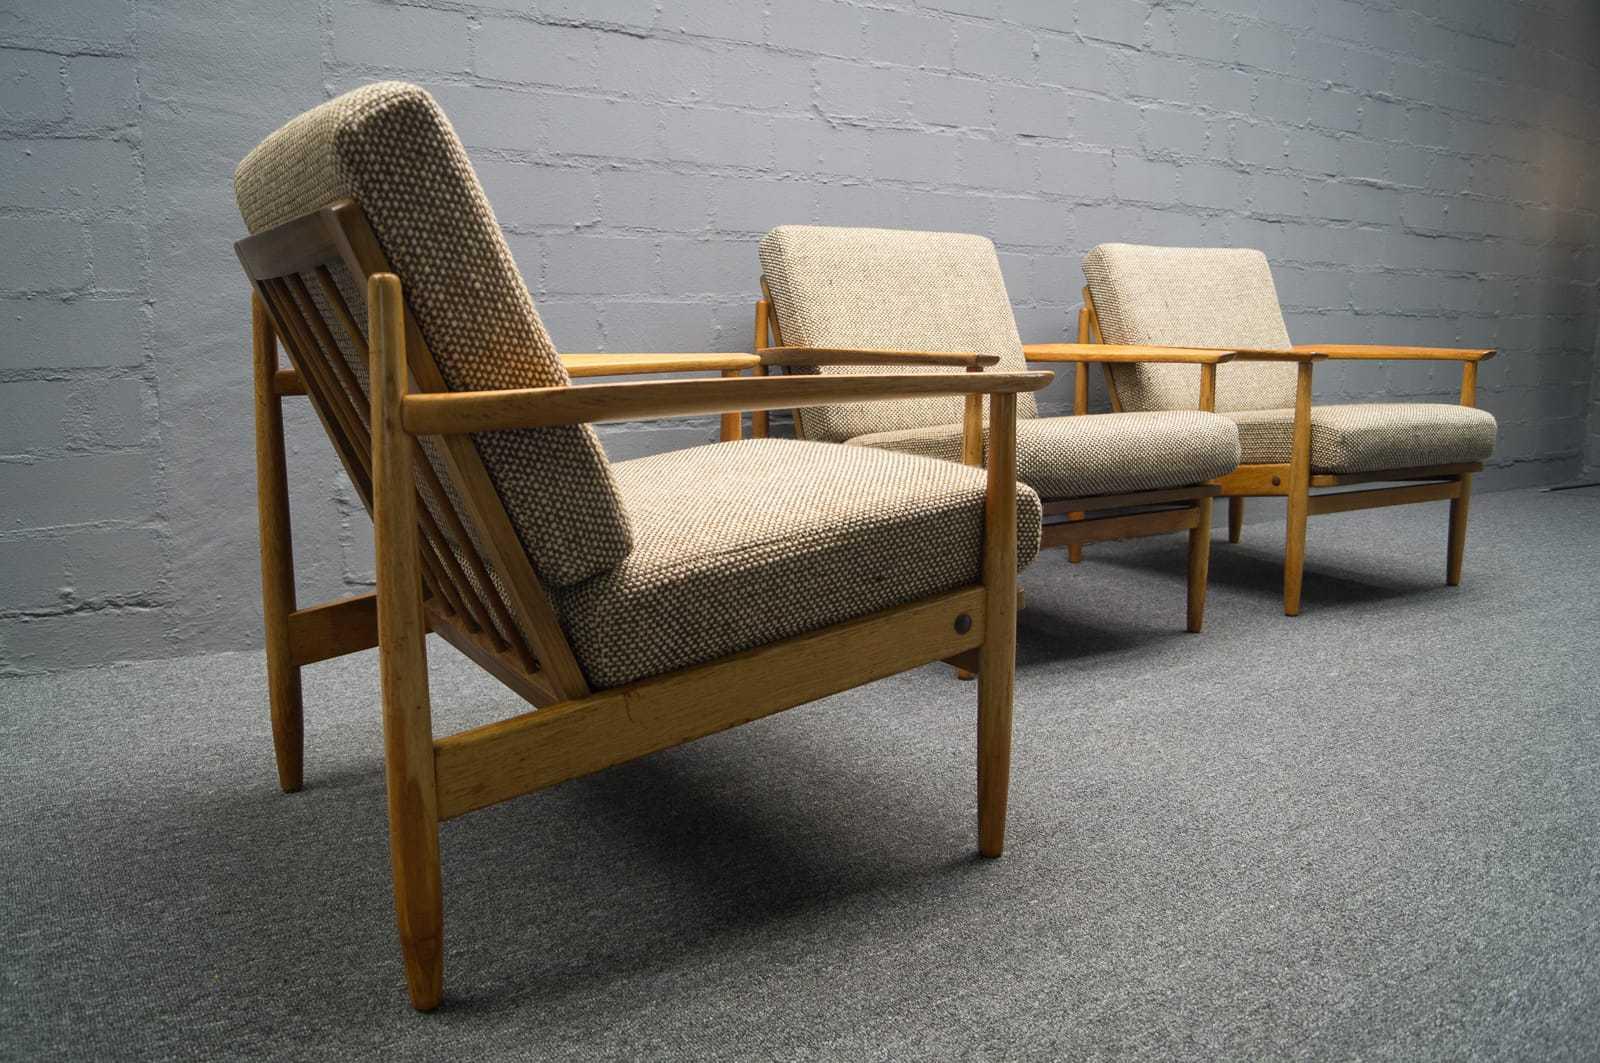 2x sofa daybed 3x sessel skandinavische sitzgruppe. Black Bedroom Furniture Sets. Home Design Ideas